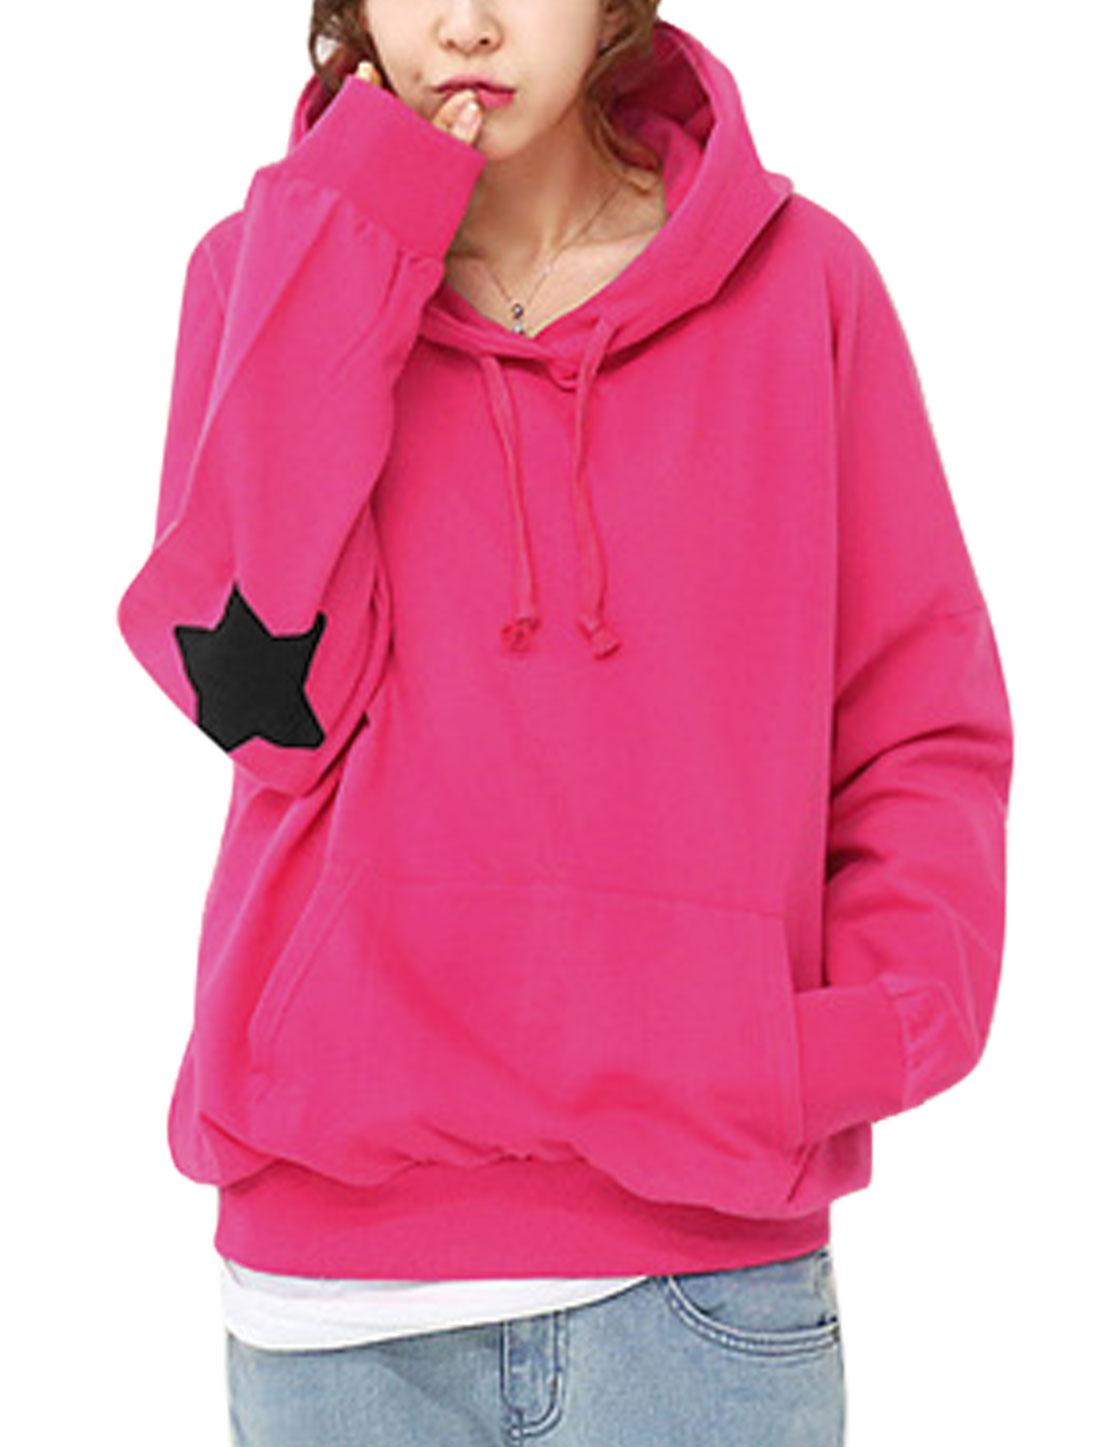 Ladies Fuchsia Pullover Drawstring Kangaroo Pockets Hoodie Sweatshirt XS